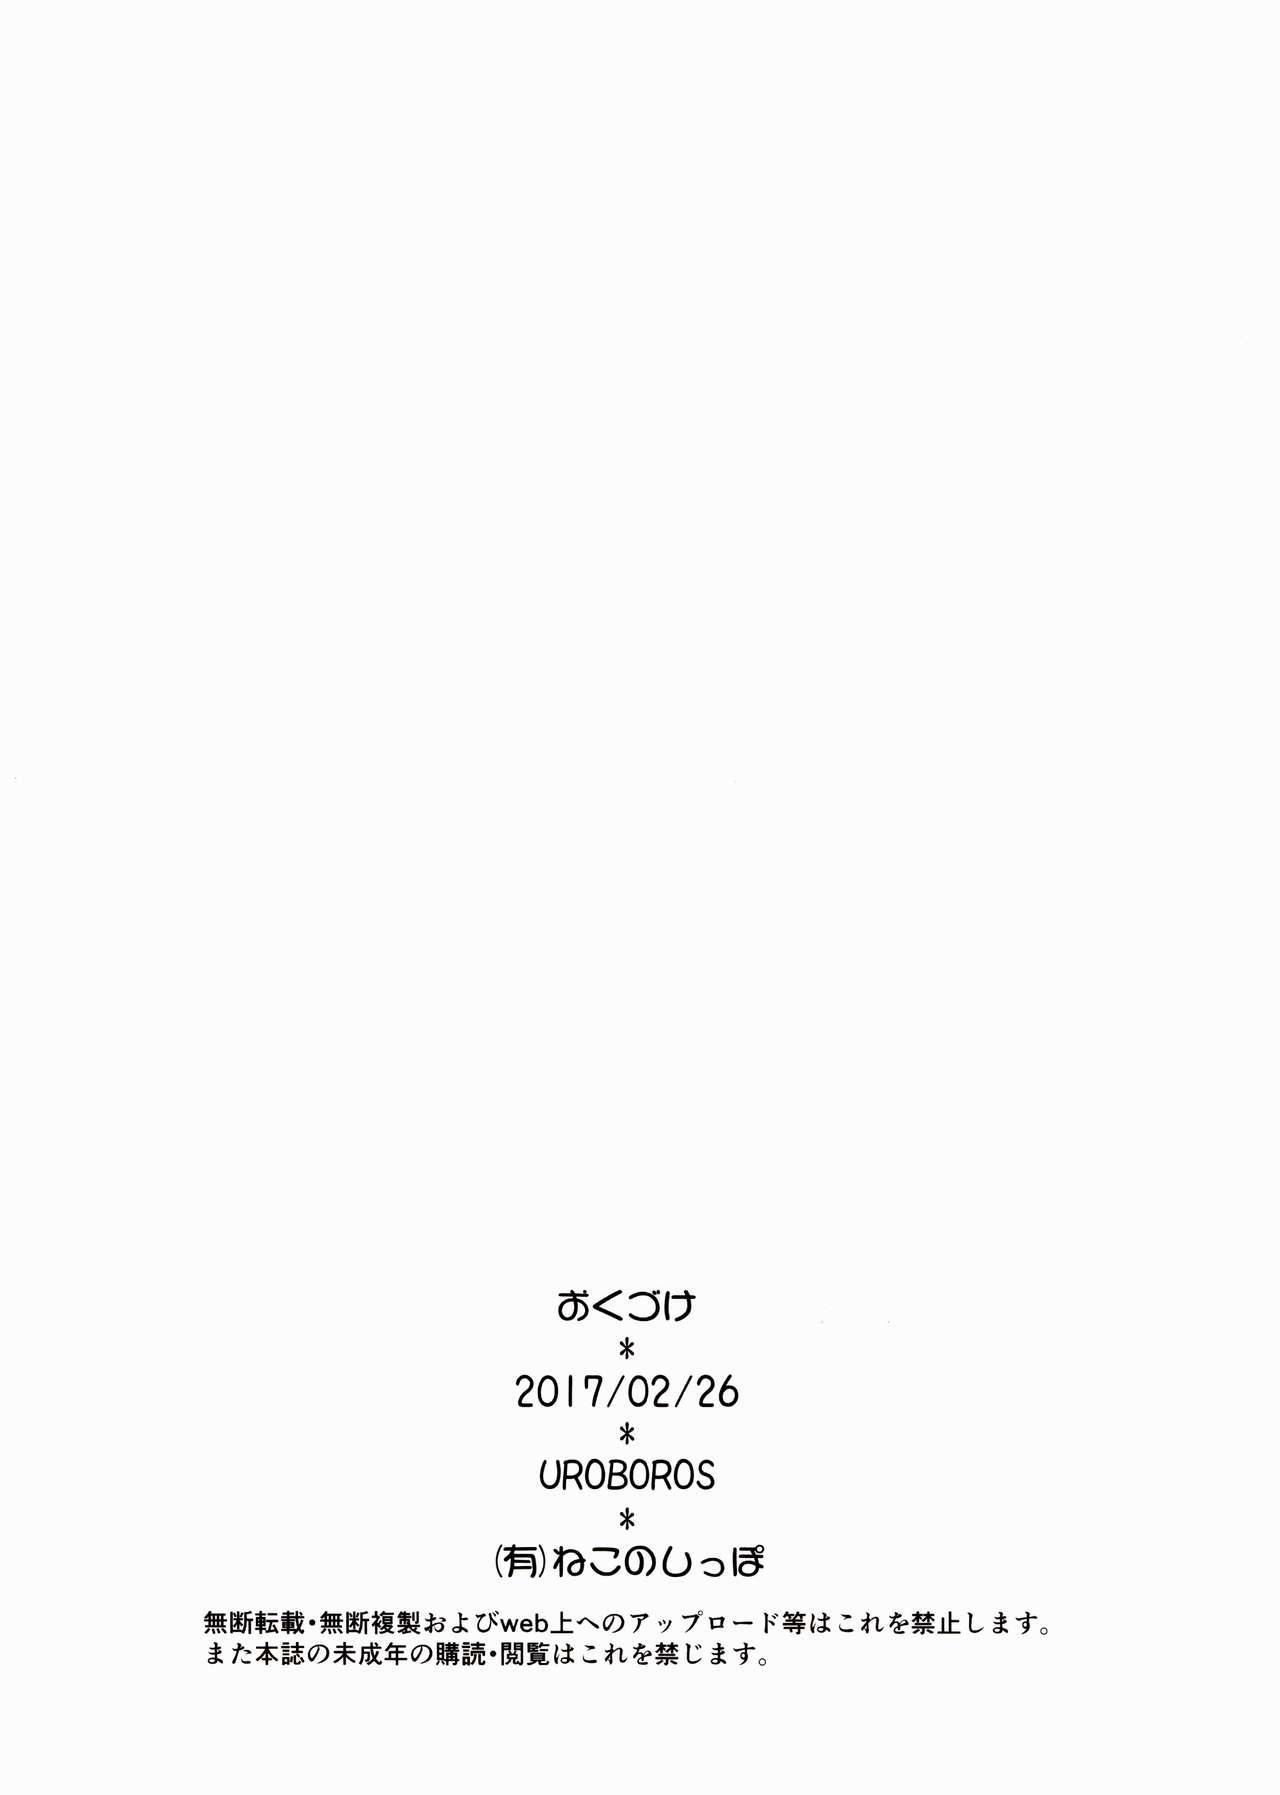 (SC2017 Winter) [UROBOROS (Utatane Hiroyuki)] Futomomo Hime (Kobayashi-san-chi no Maid Dragon) [Chinese] [朔夜x oo君漢化] 15